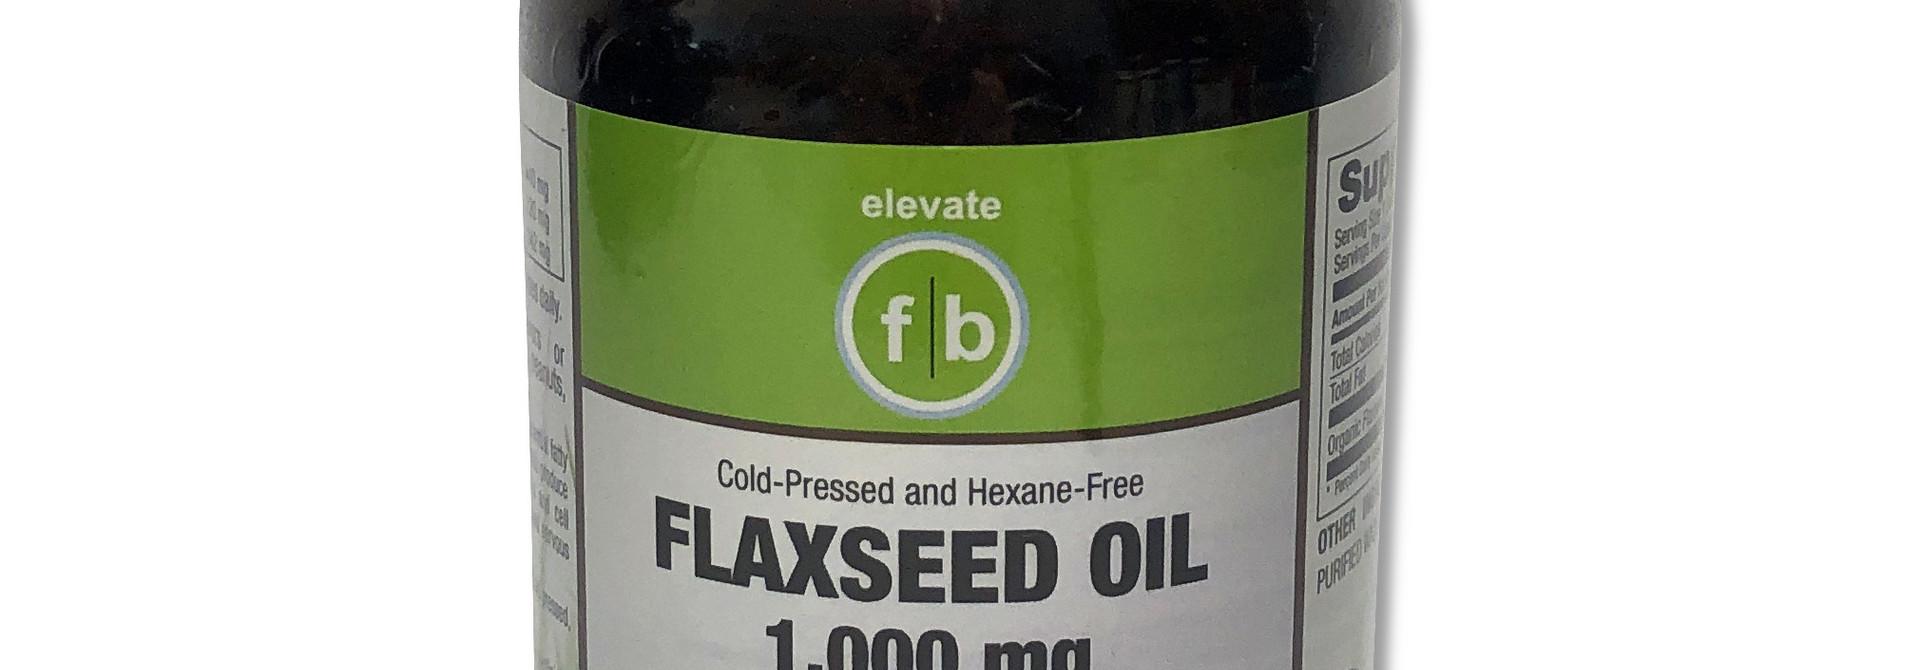 Organic Flaxseed Oil 1,000mg